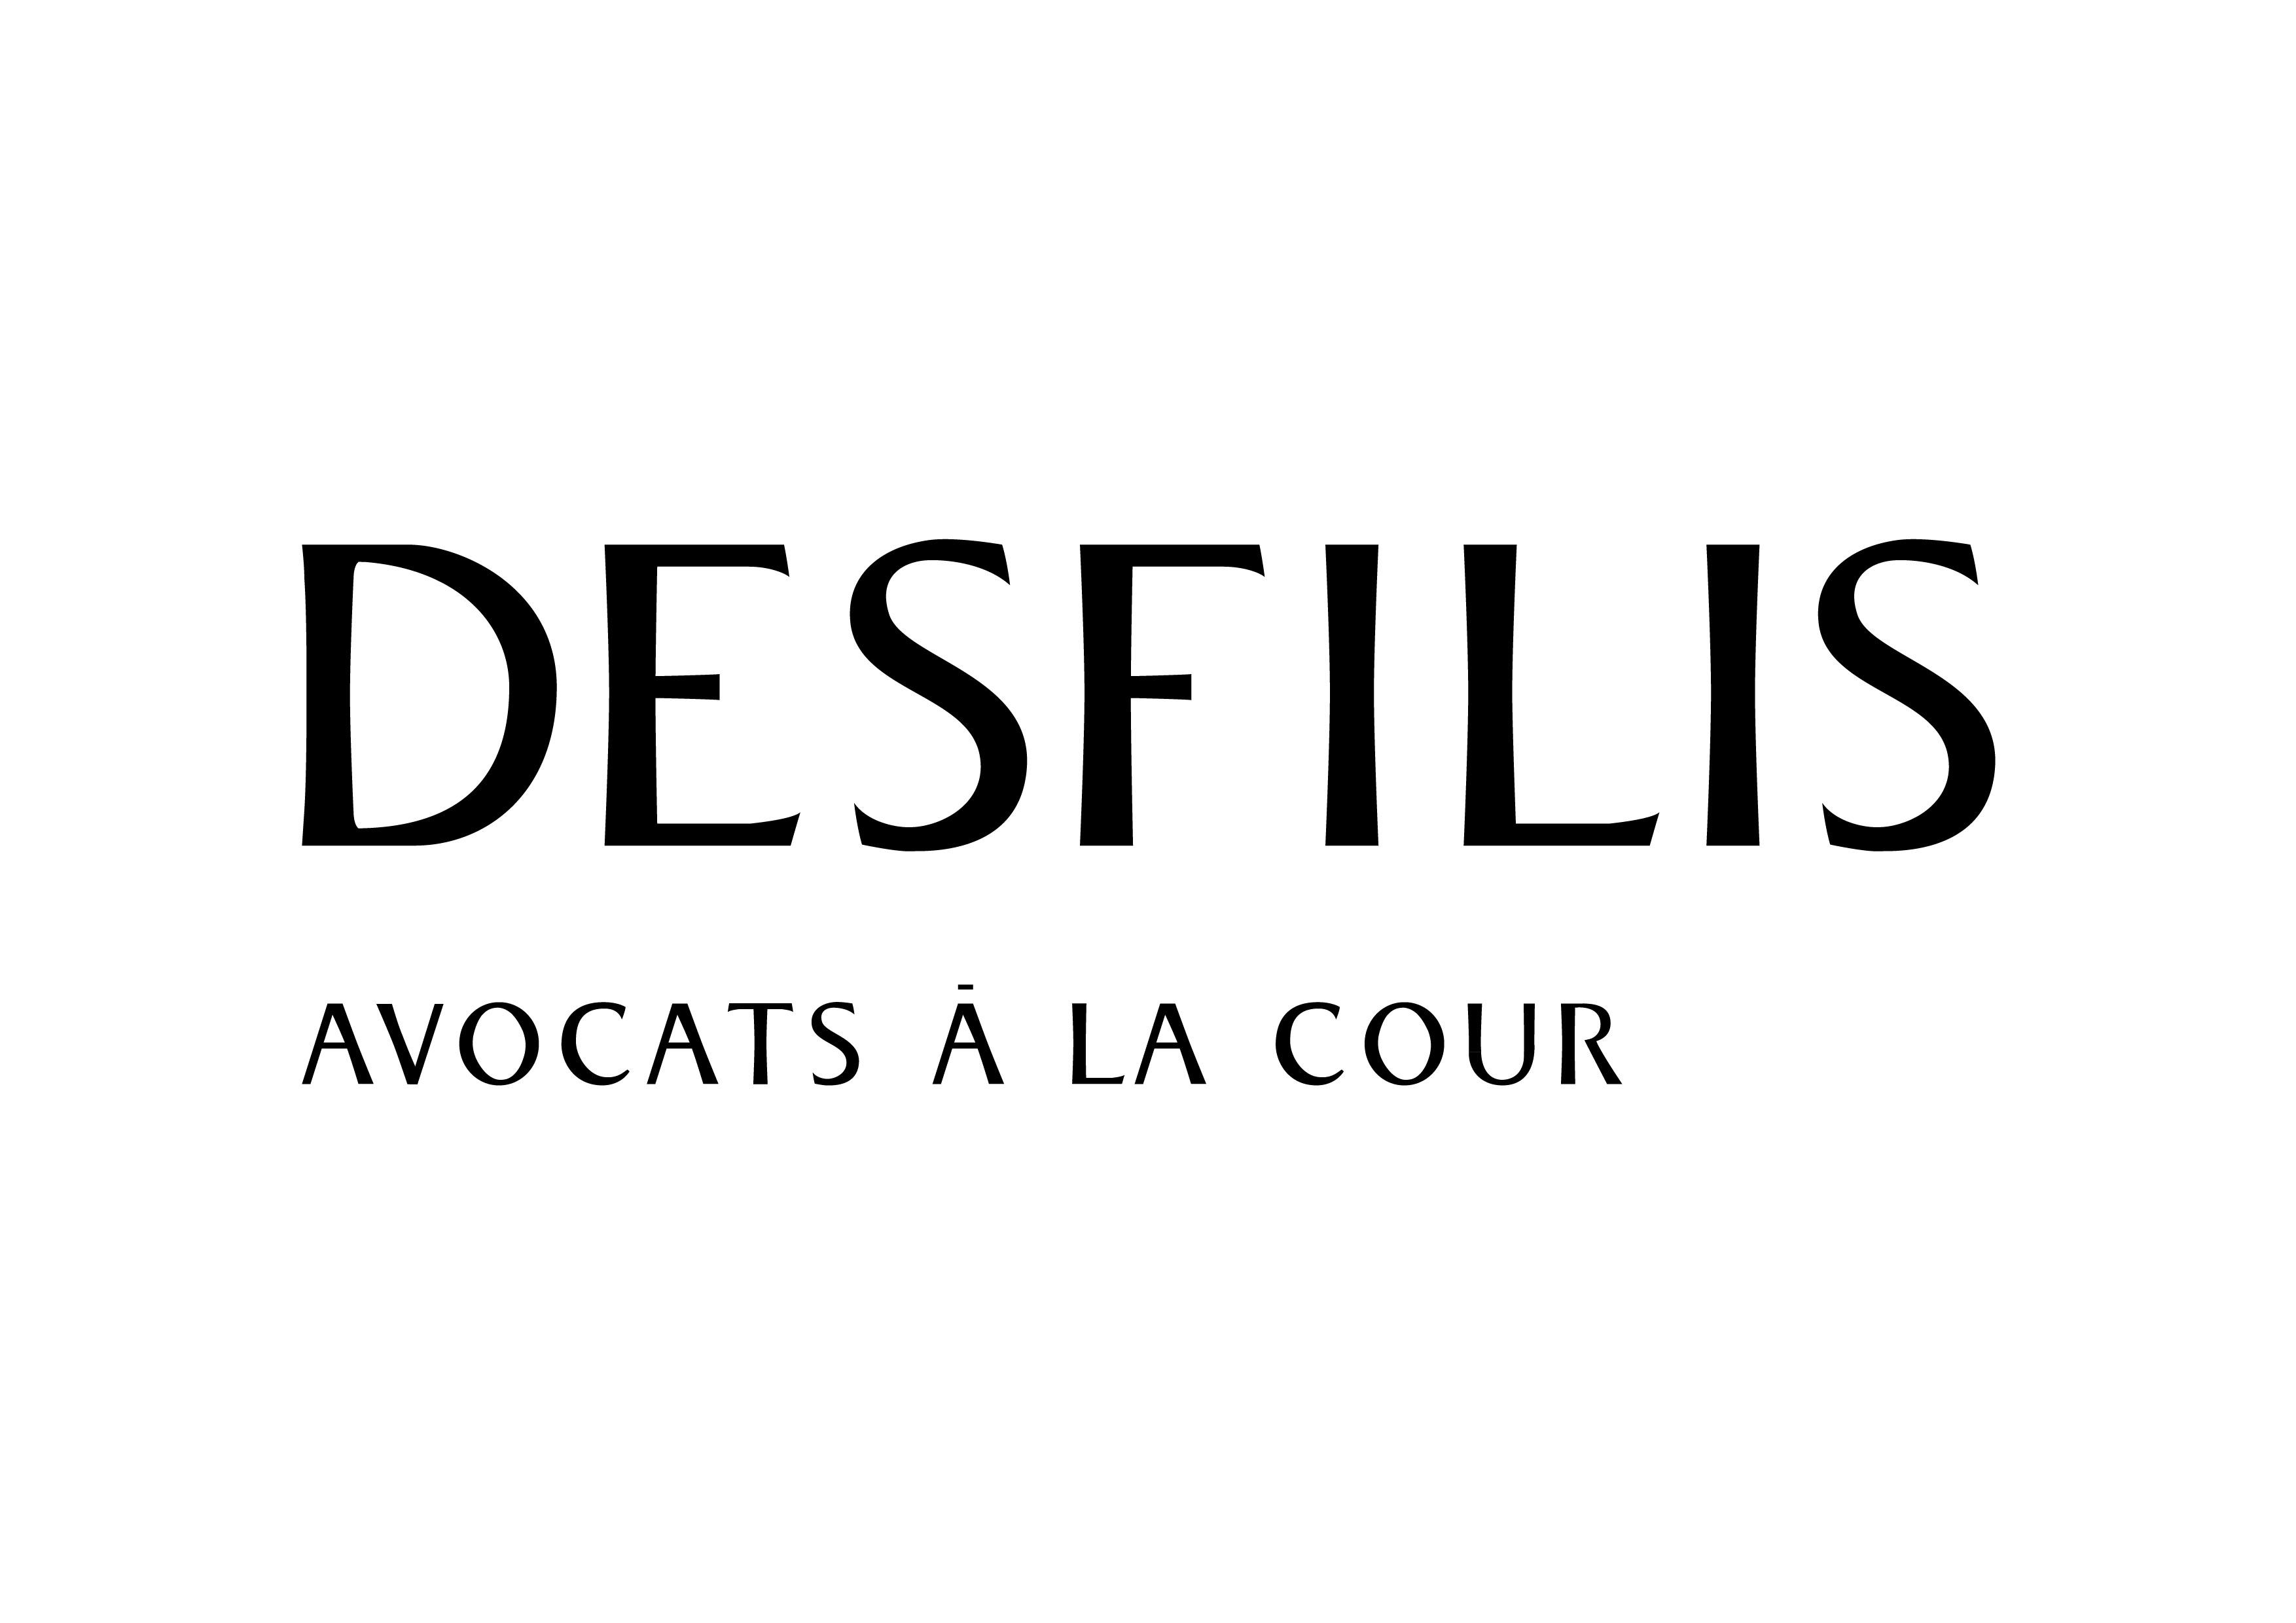 the Desfilis logo.